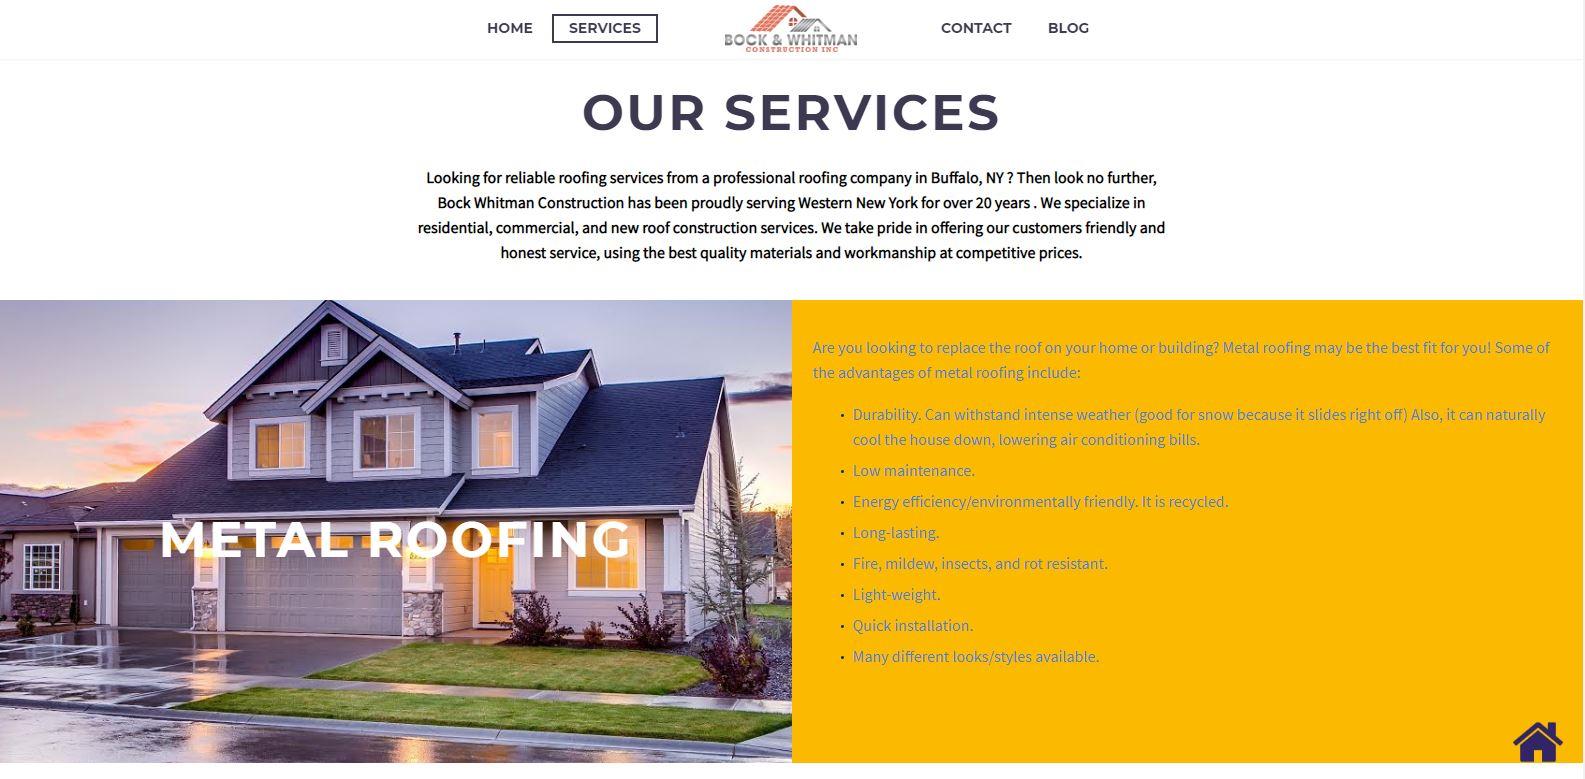 Buffalo Website Builder Bock And Whitman Portfolio